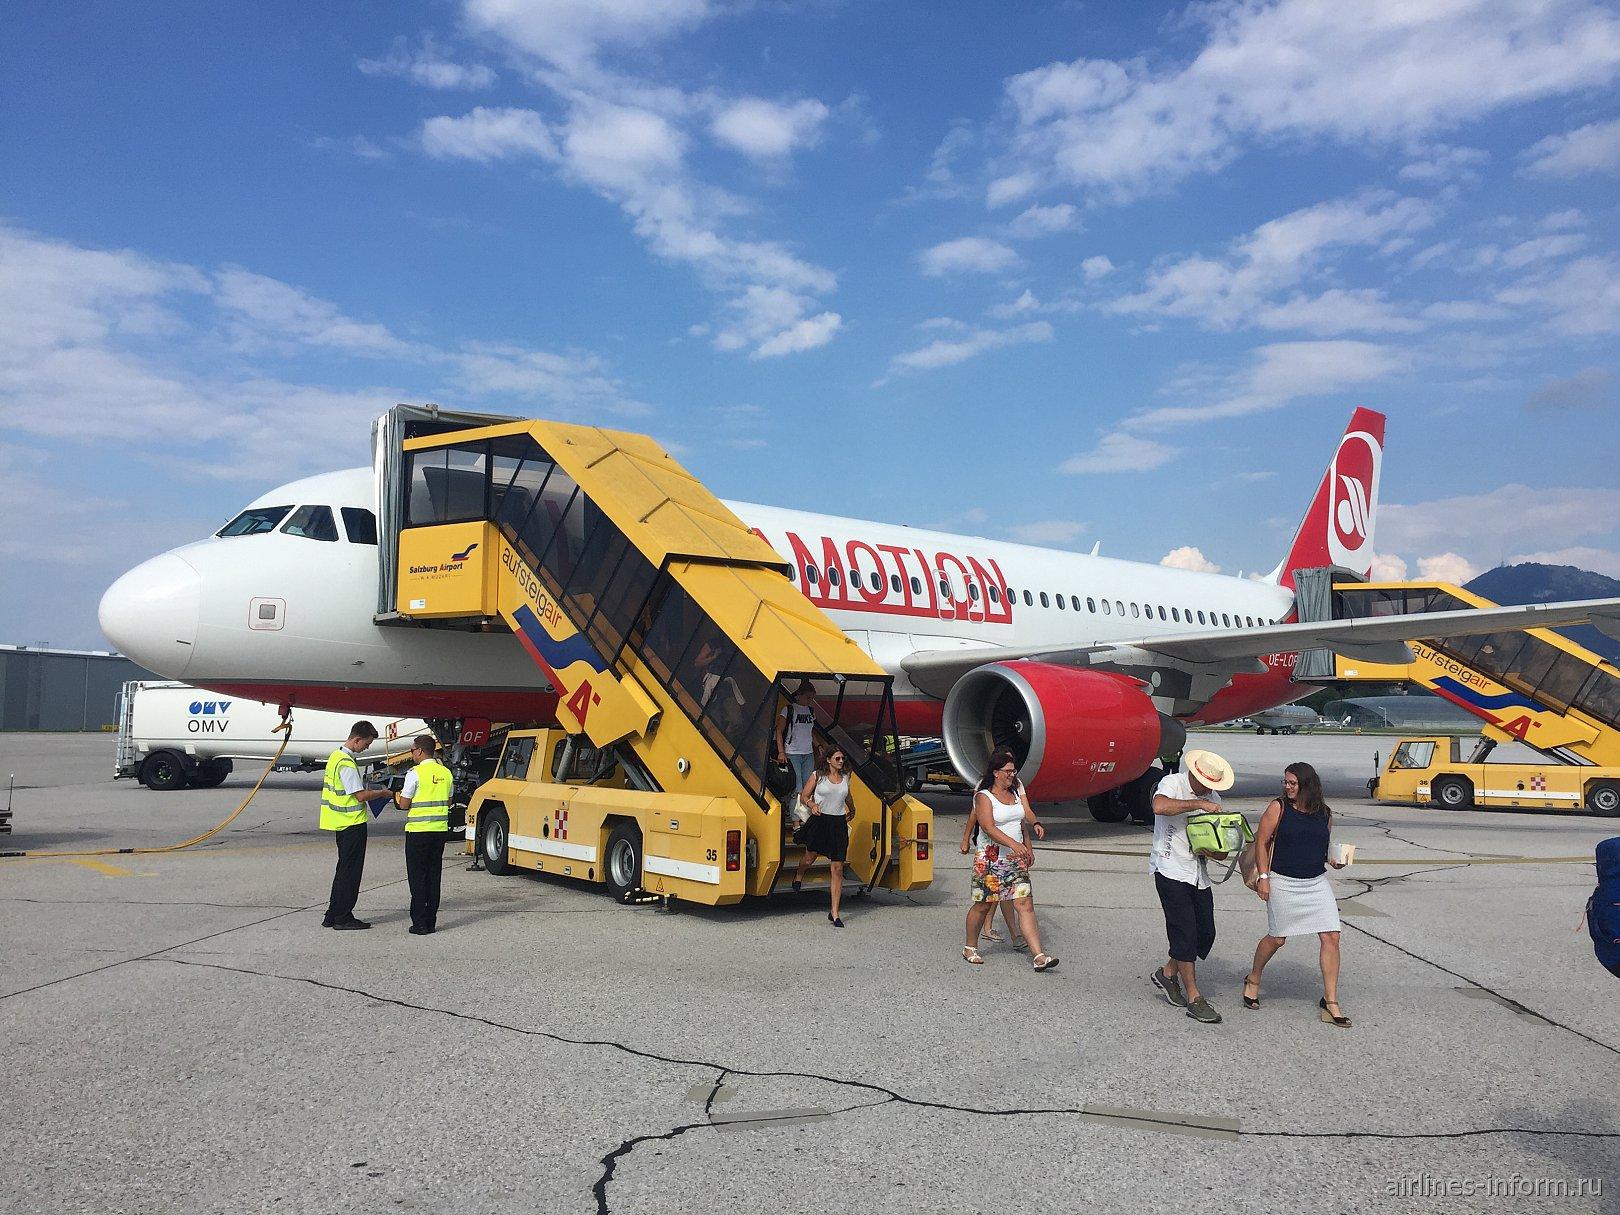 PMI-SZG: полет с LAUDAMOTION